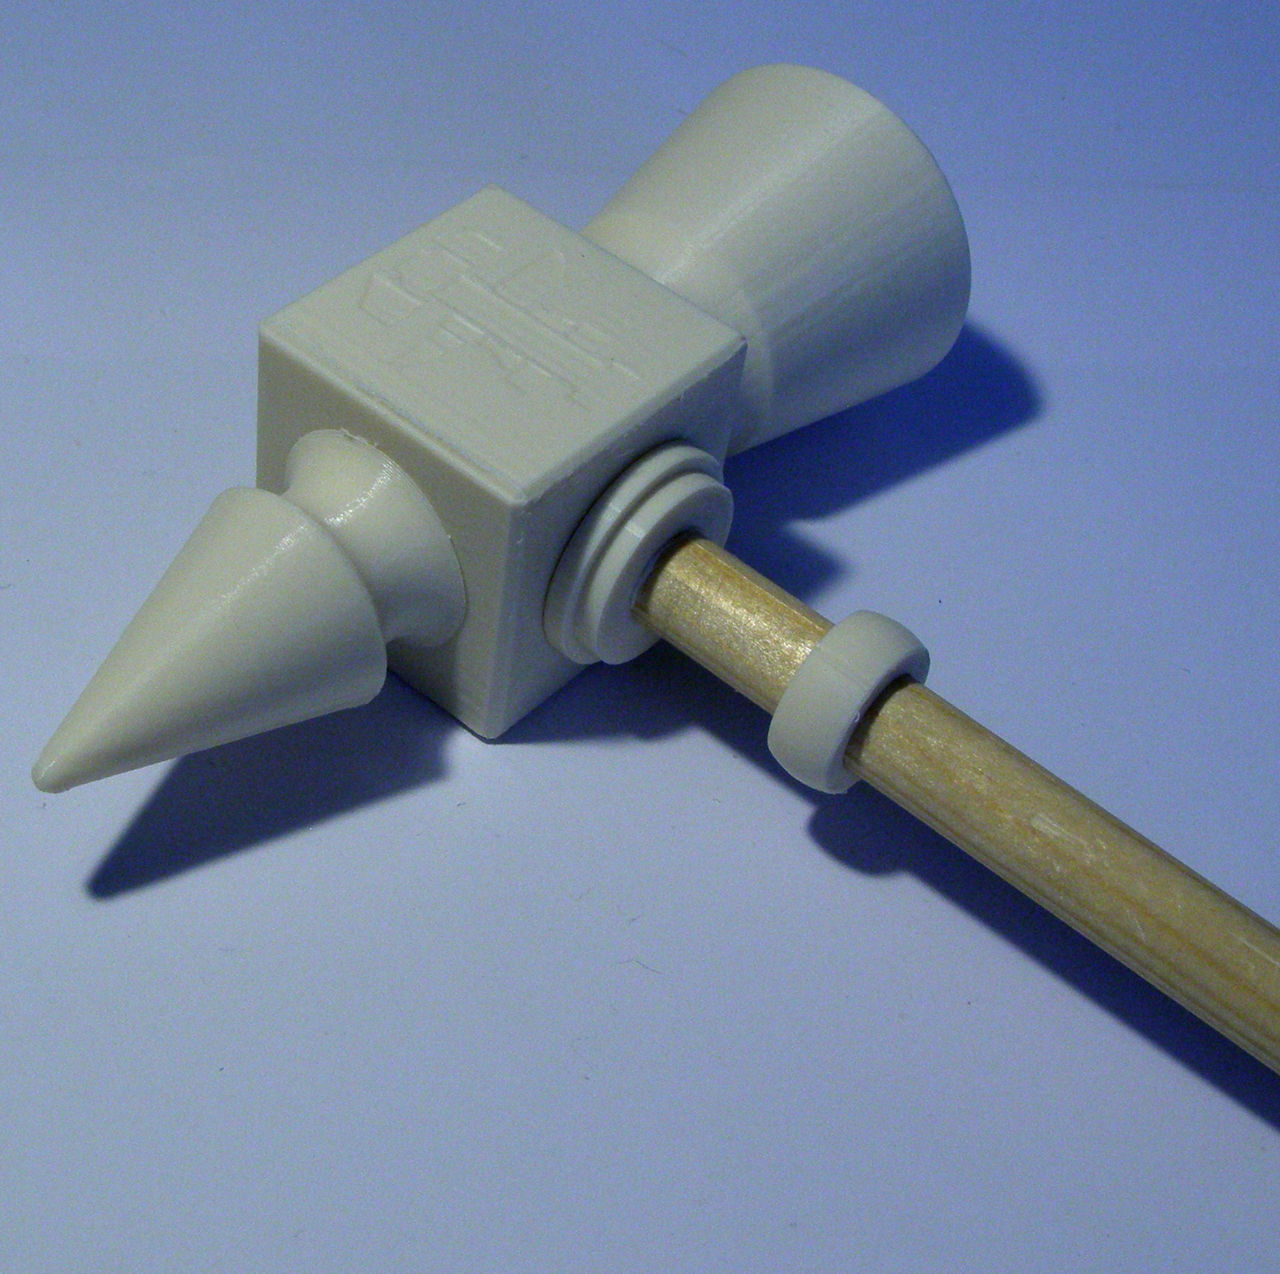 Aegis-fang- Wulfgar's Hammer (Printable) image